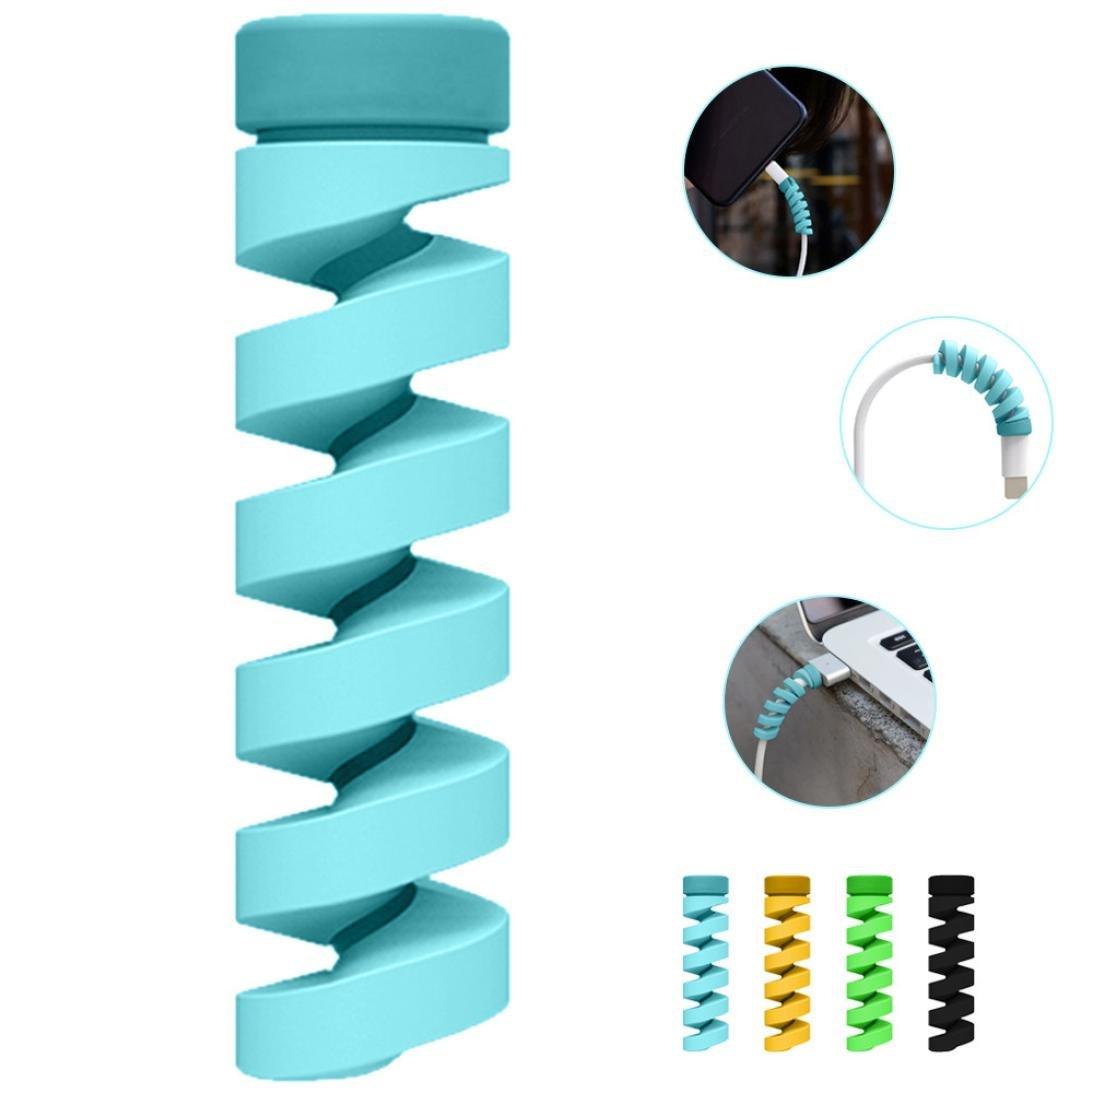 ... Cable Saver Protectores De Alivio De TensióN Spiral Wrap En Universal para MóVil/Auricular/Cable De Datos (Talla única, Azul): Amazon.es: Electrónica